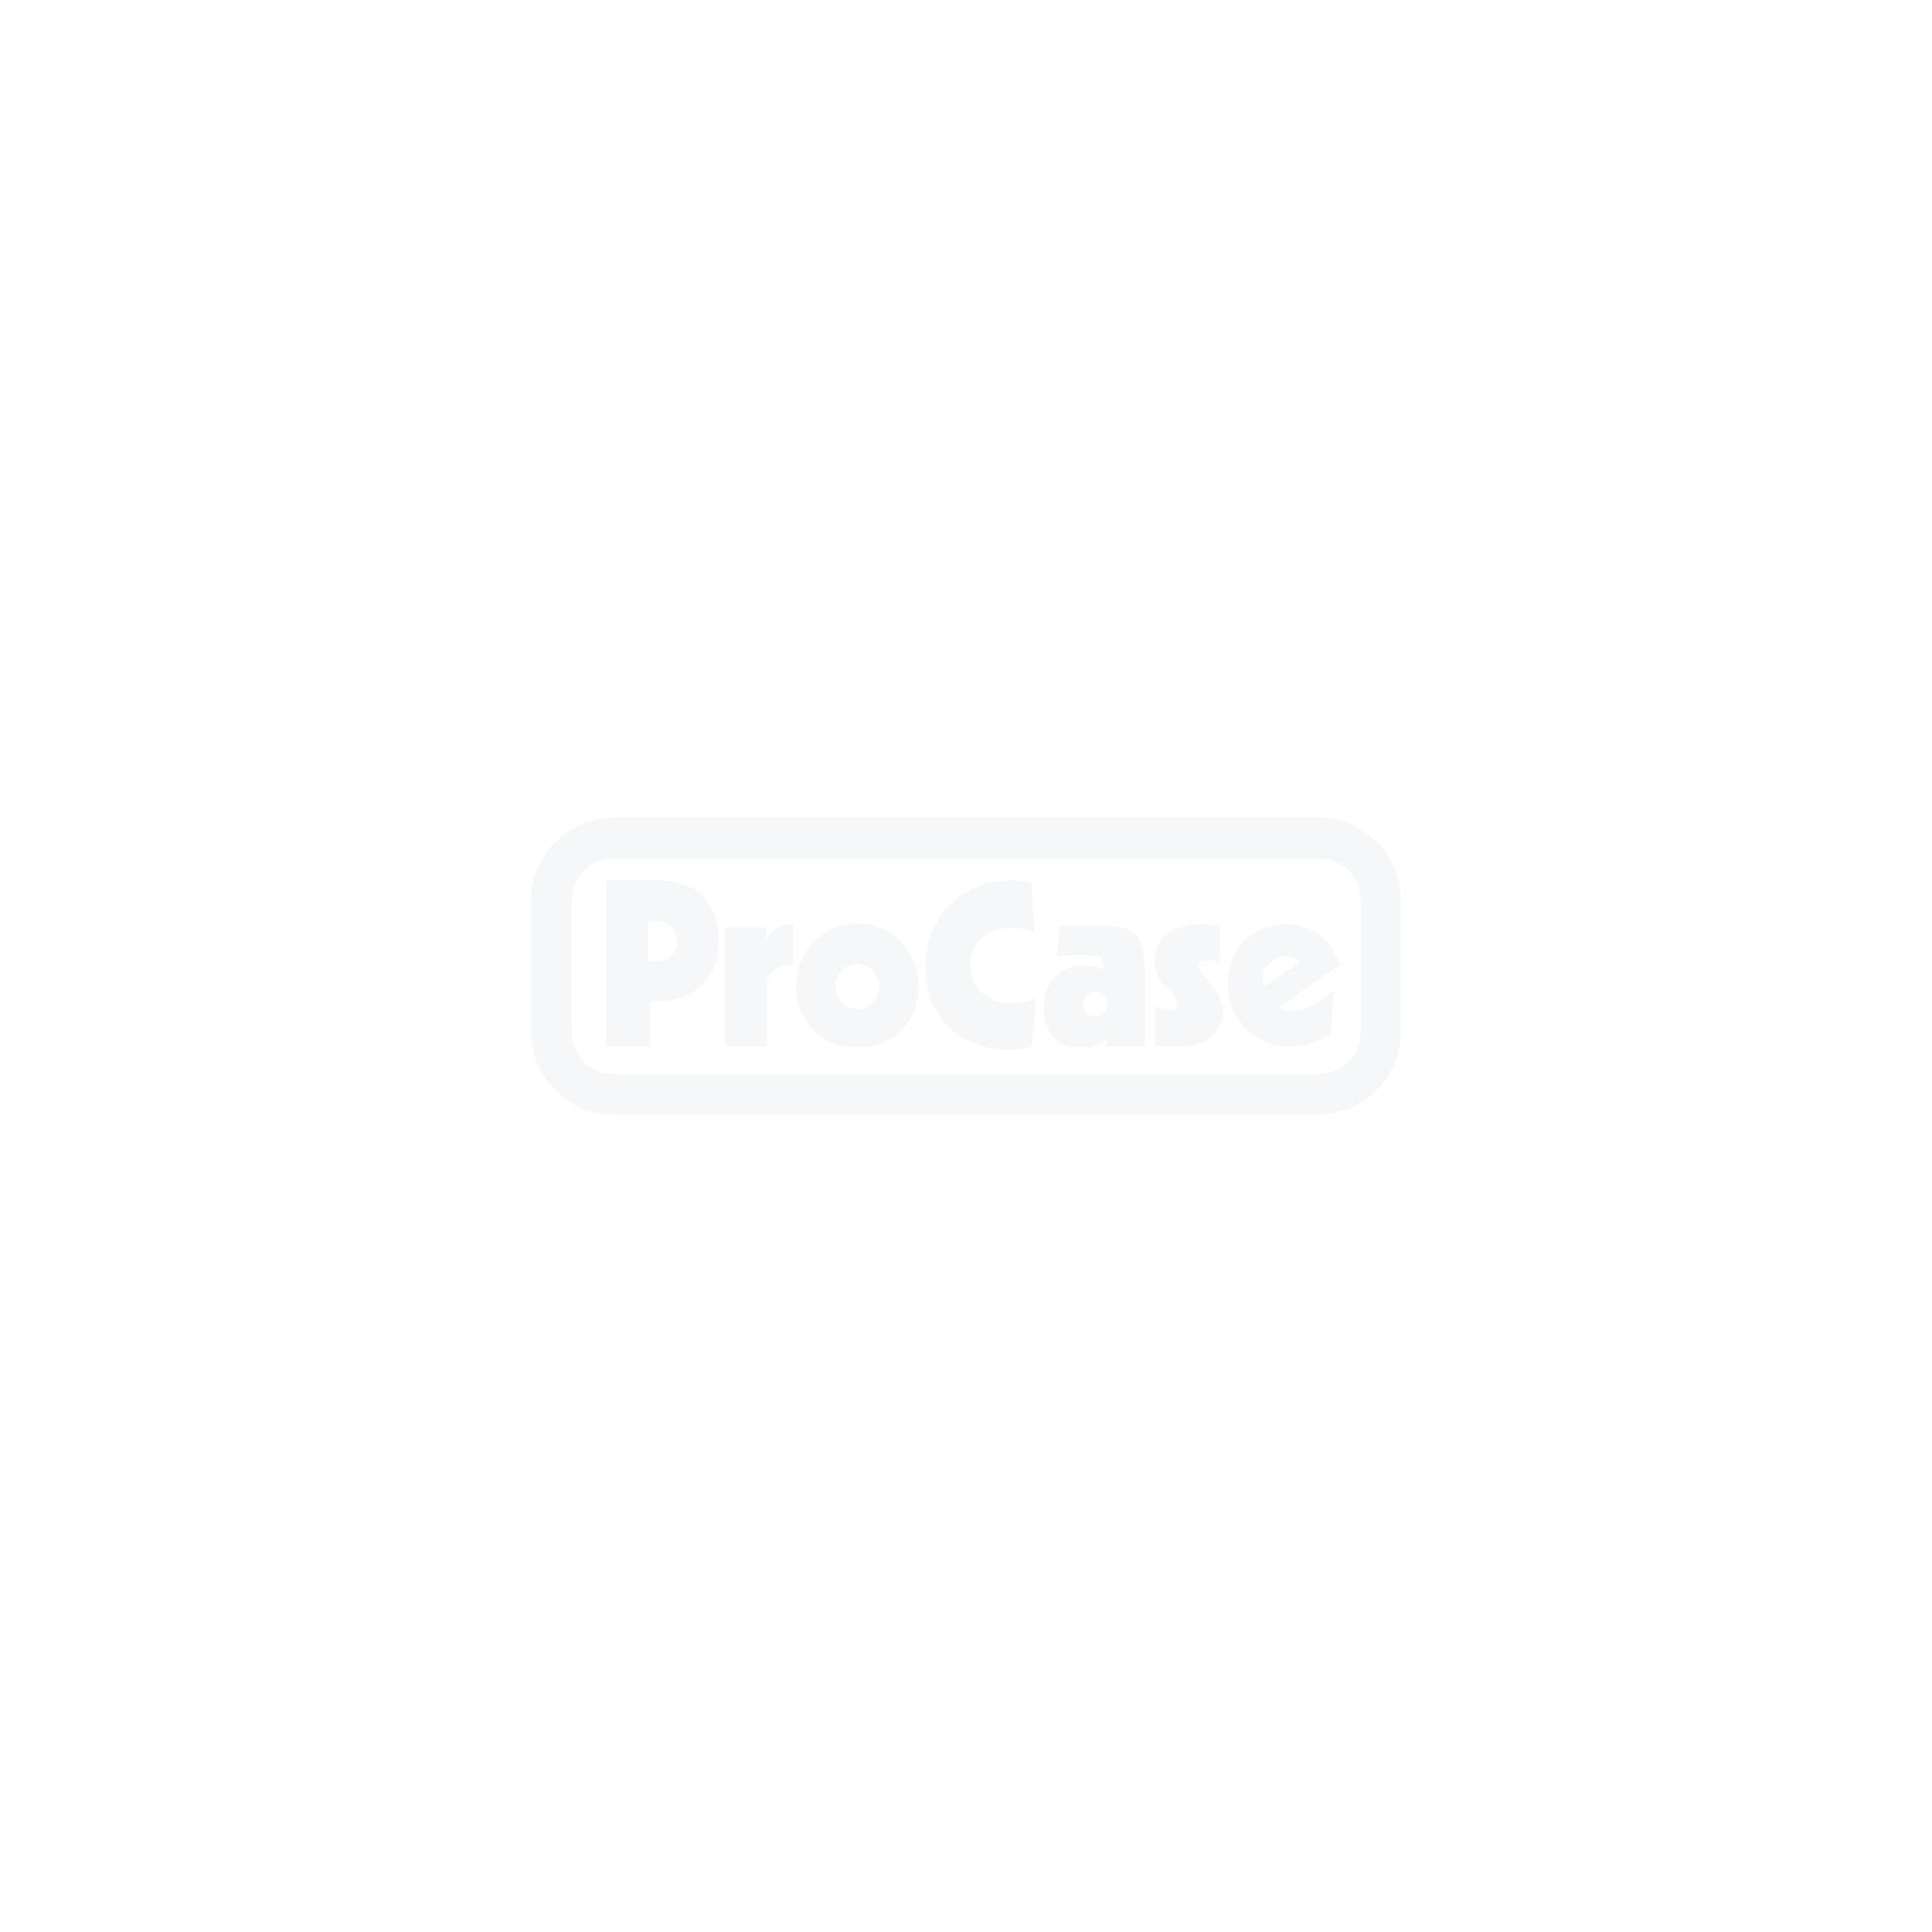 B-Ware Flightcase für d&b audiotechnik Y8/Y12 4er Cradle